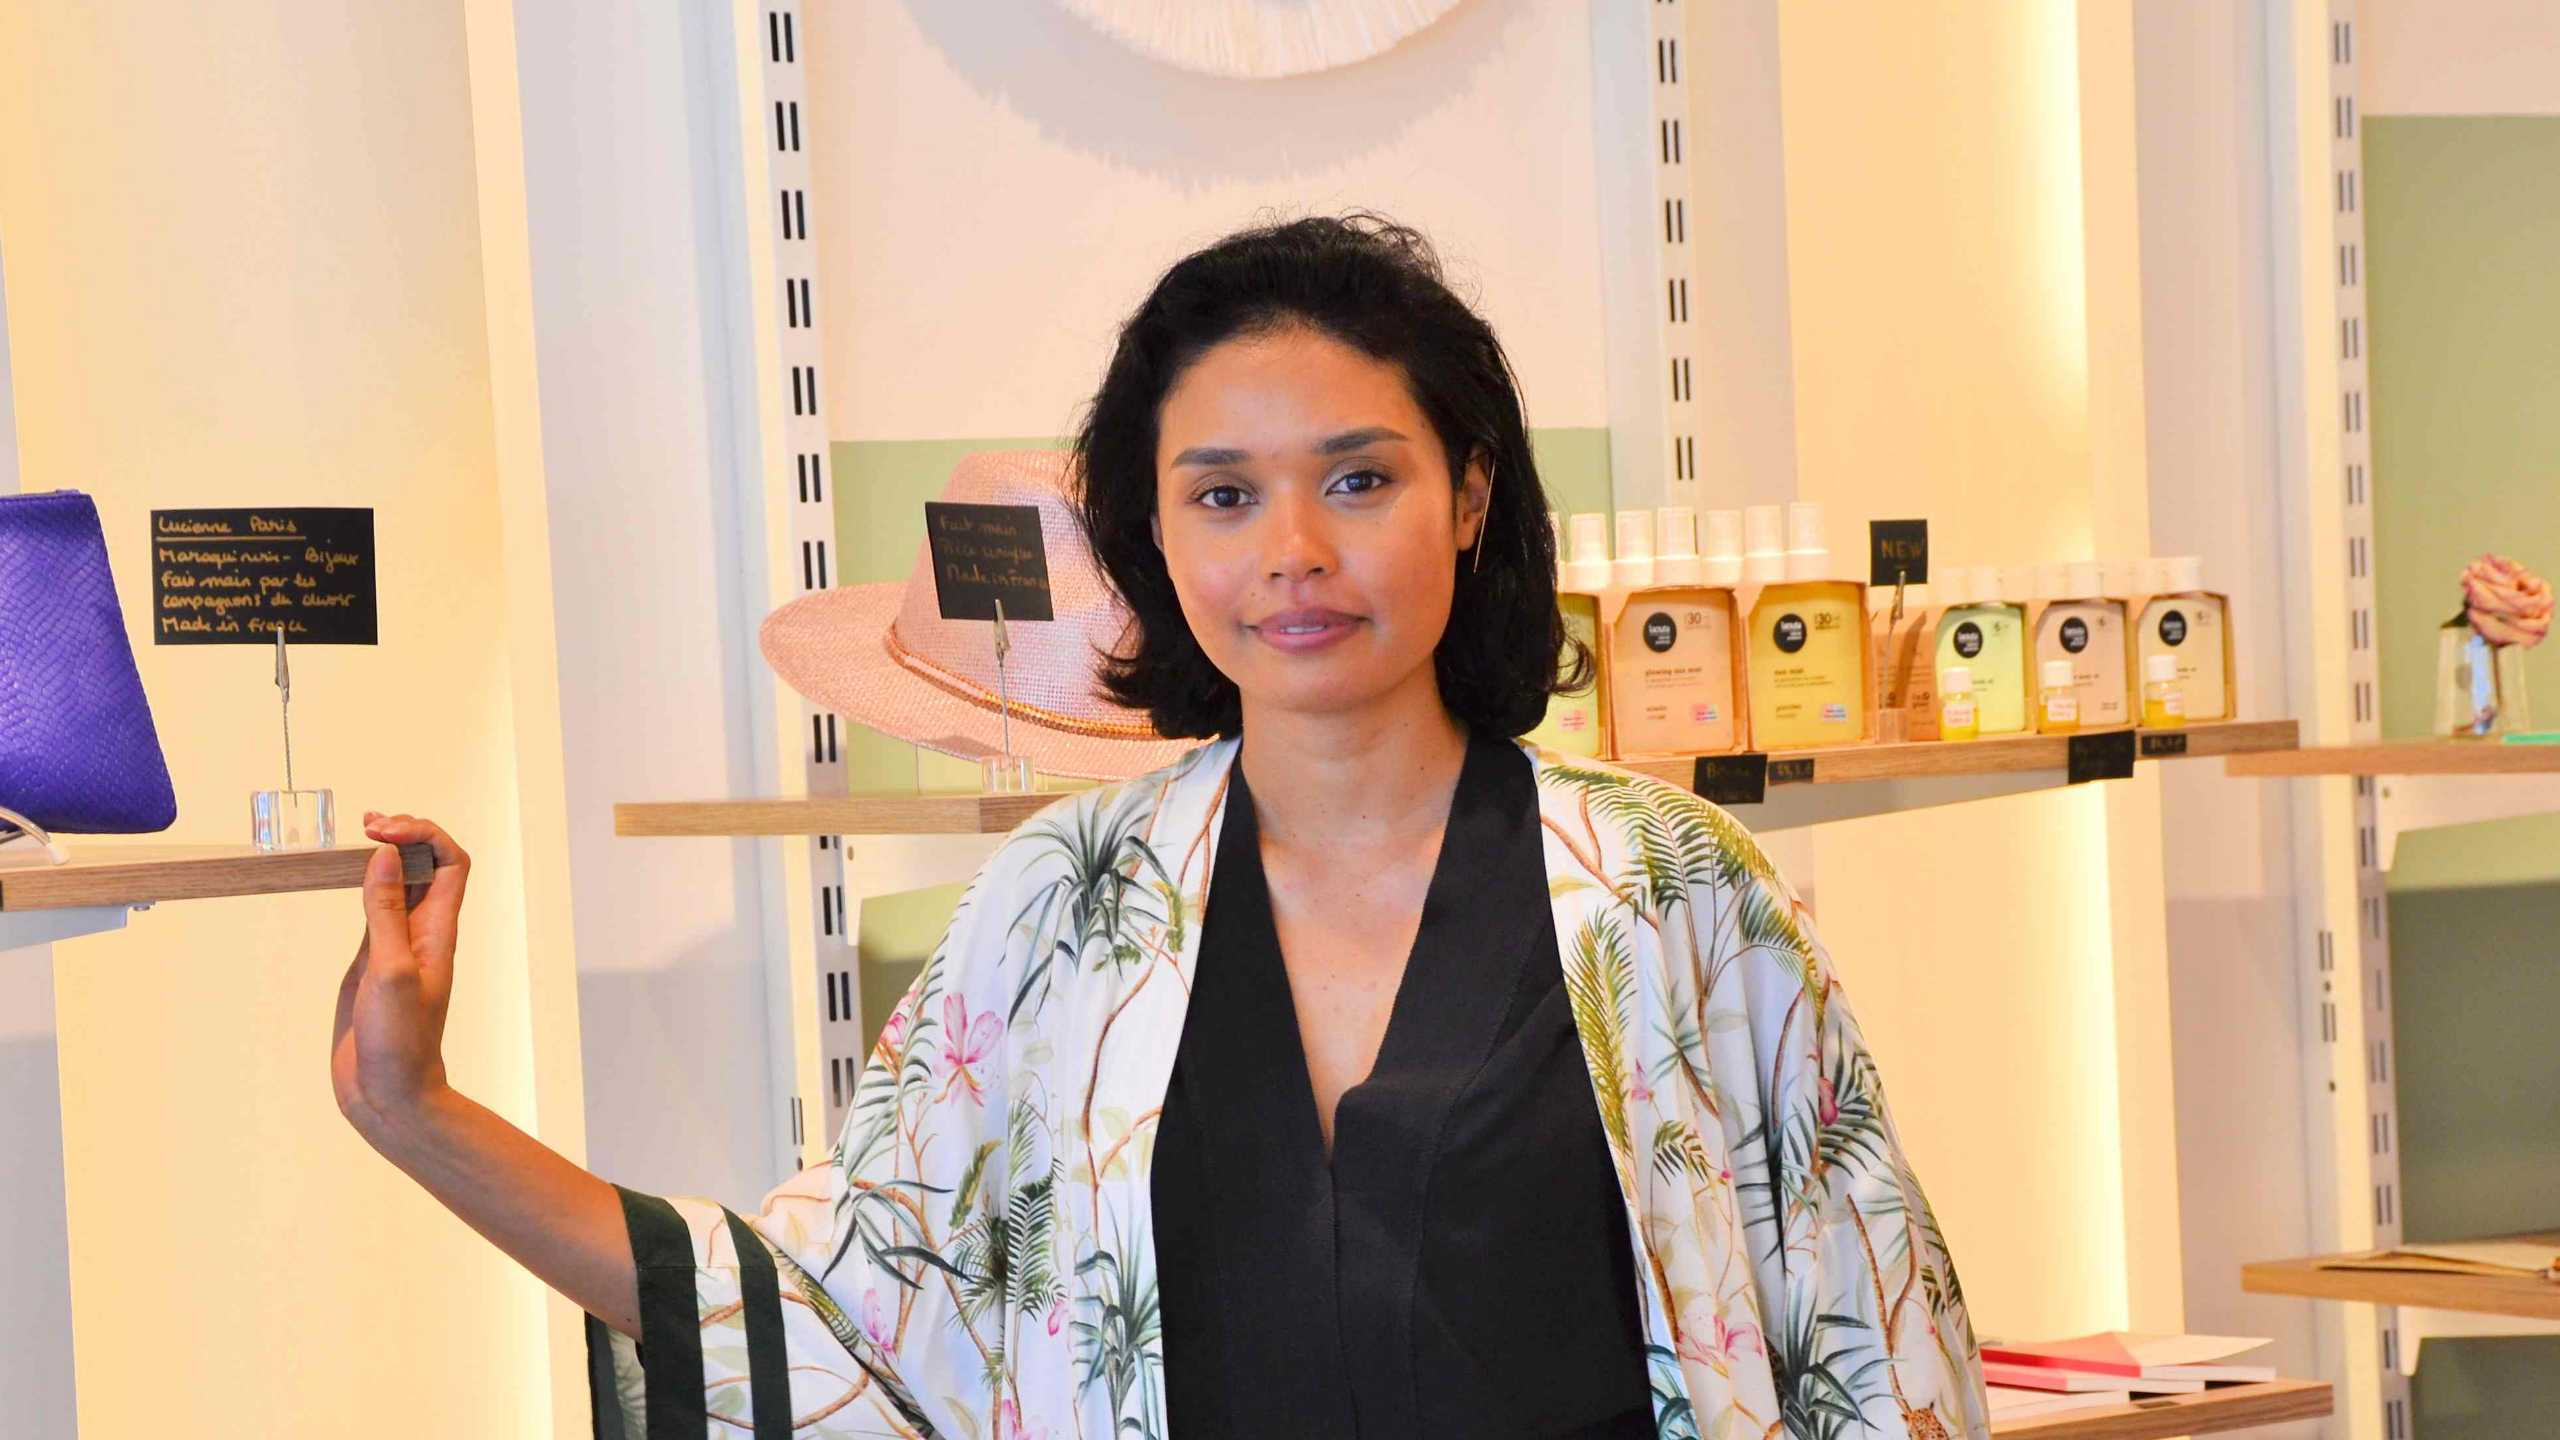 b.a.m concept store mode femme boulogne-billancourt